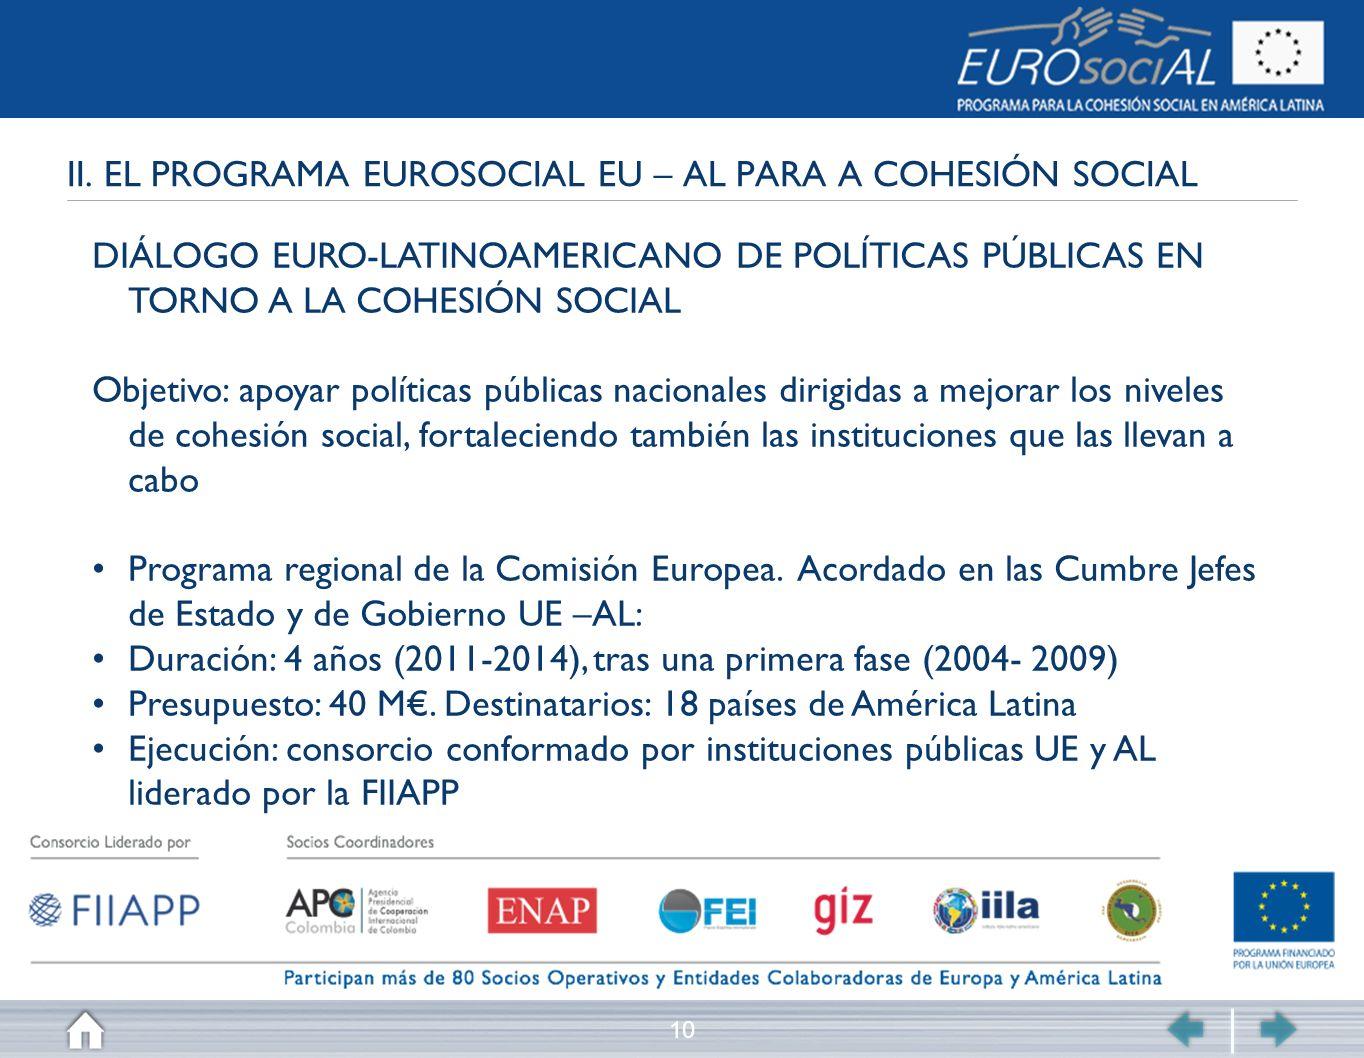 10 II. EL PROGRAMA EUROSOCIAL EU – AL PARA A COHESIÓN SOCIAL DIÁLOGO EURO-LATINOAMERICANO DE POLÍTICAS PÚBLICAS EN TORNO A LA COHESIÓN SOCIAL Objetivo